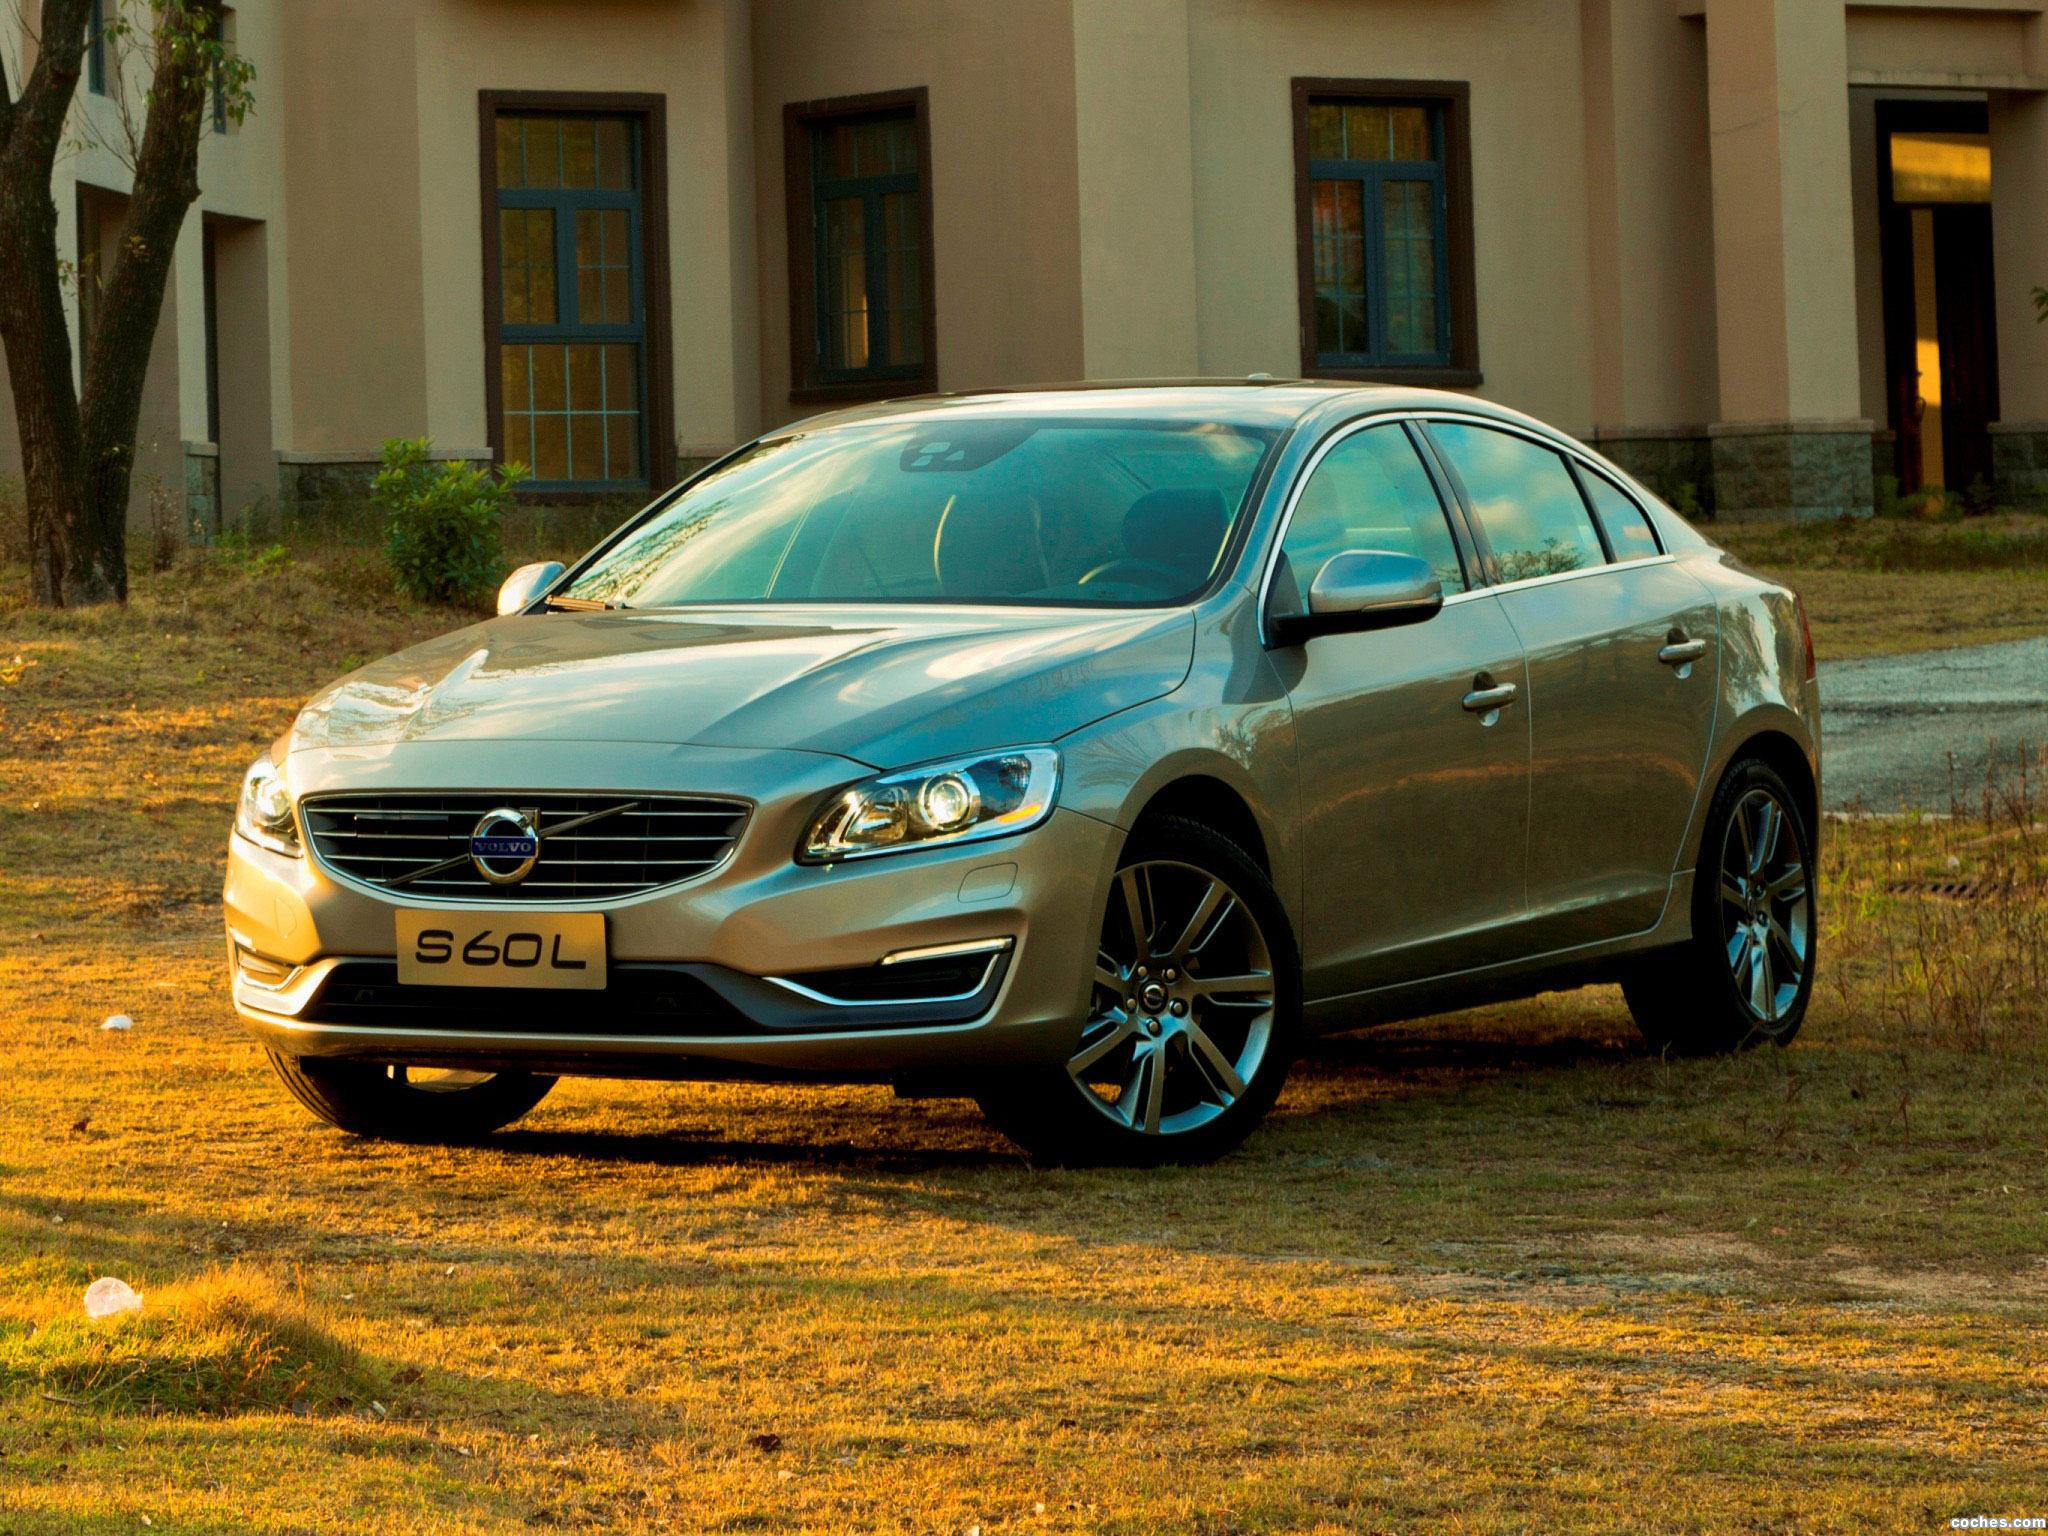 Foto 0 de Volvo S60L 2013